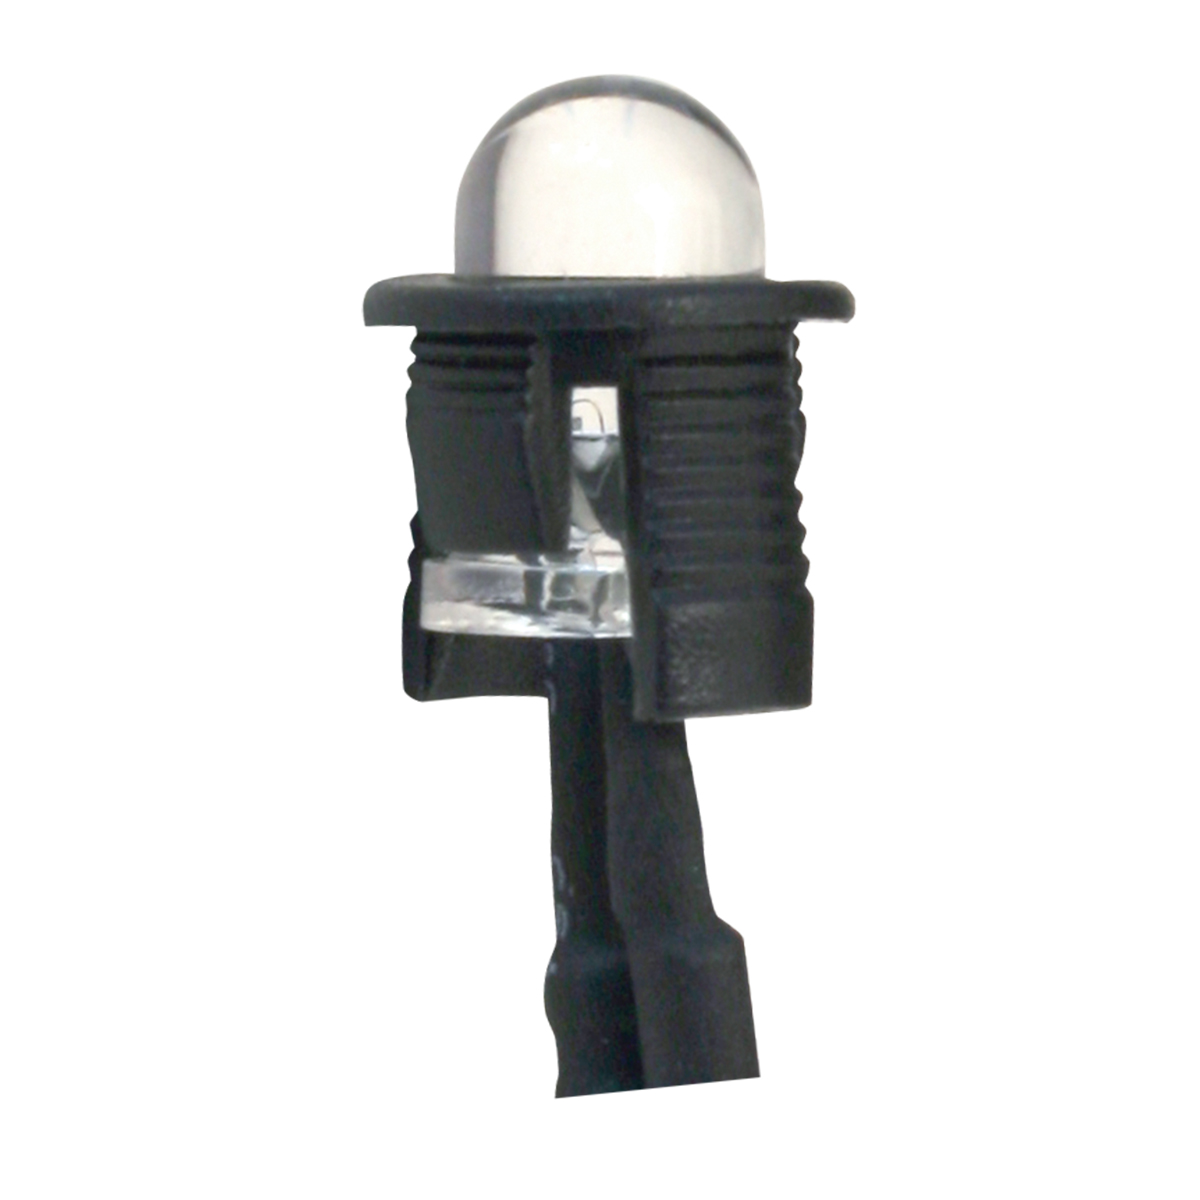 Single Red LED Light Bulb – Unlit View